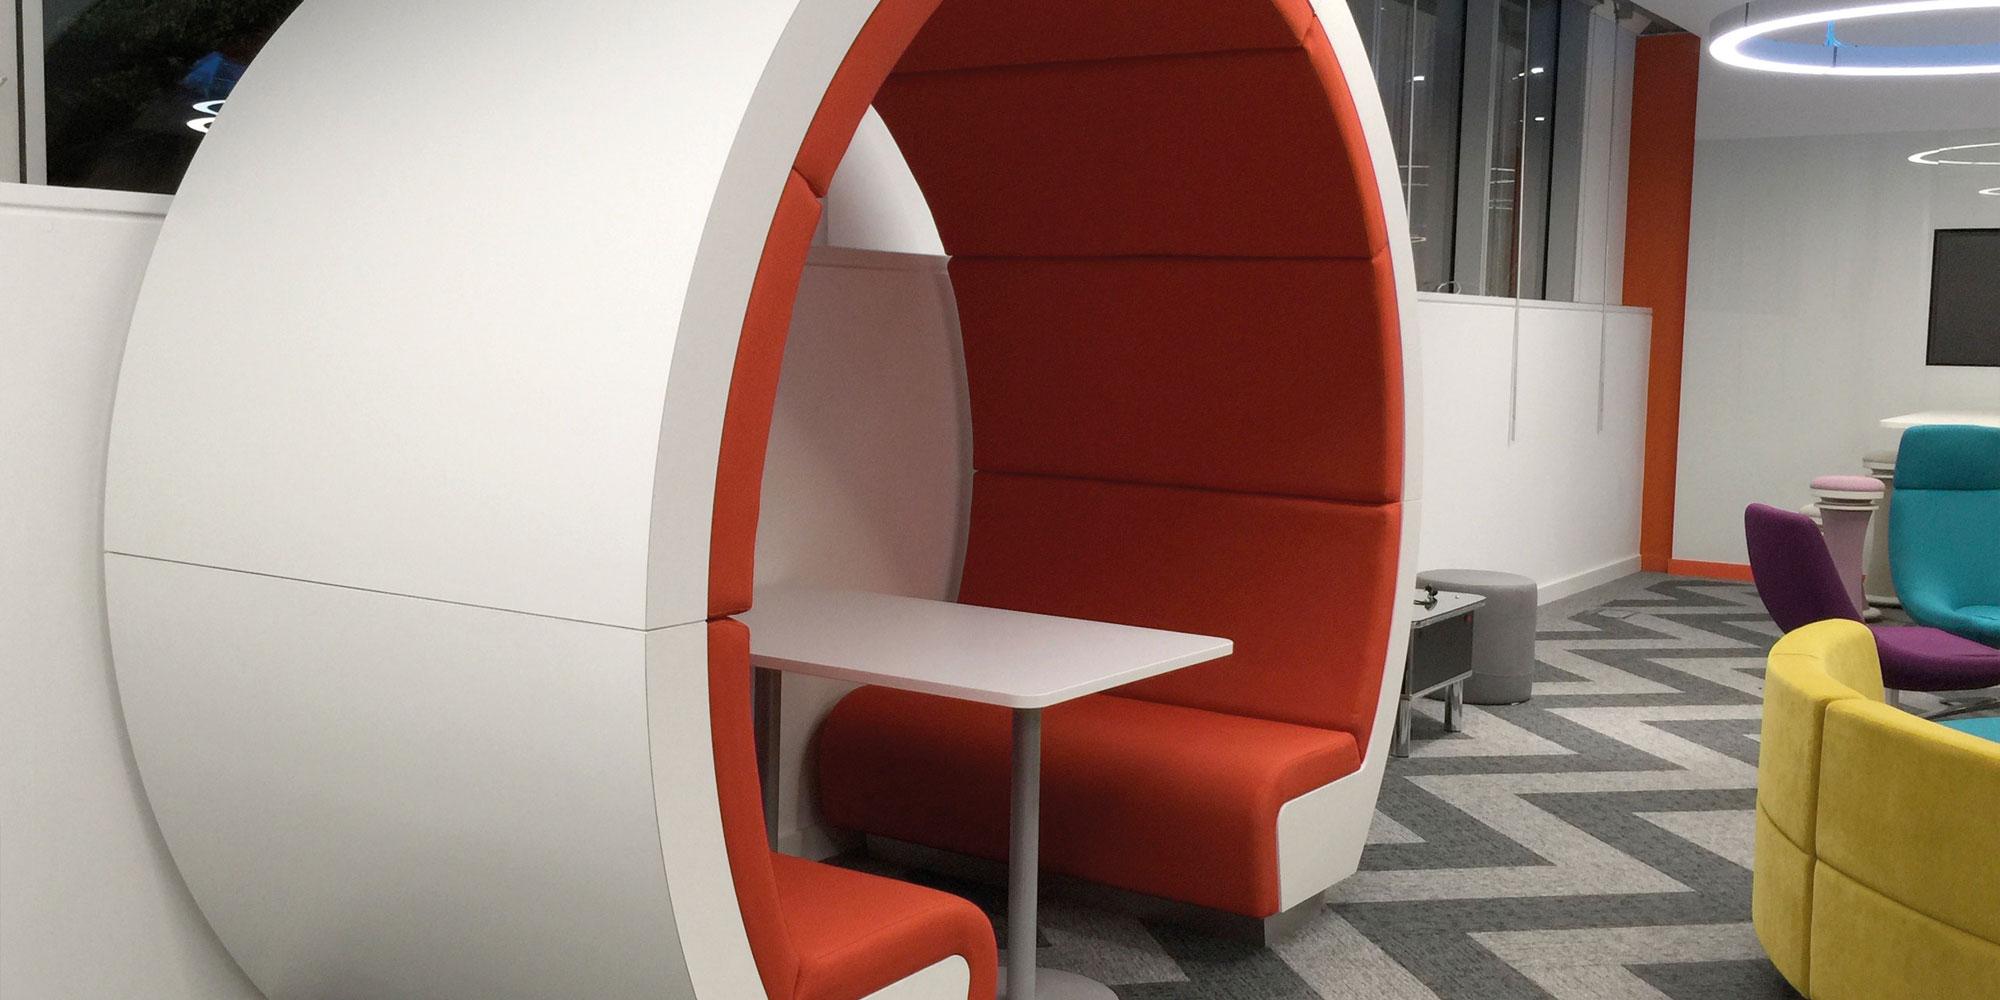 set-square-seat